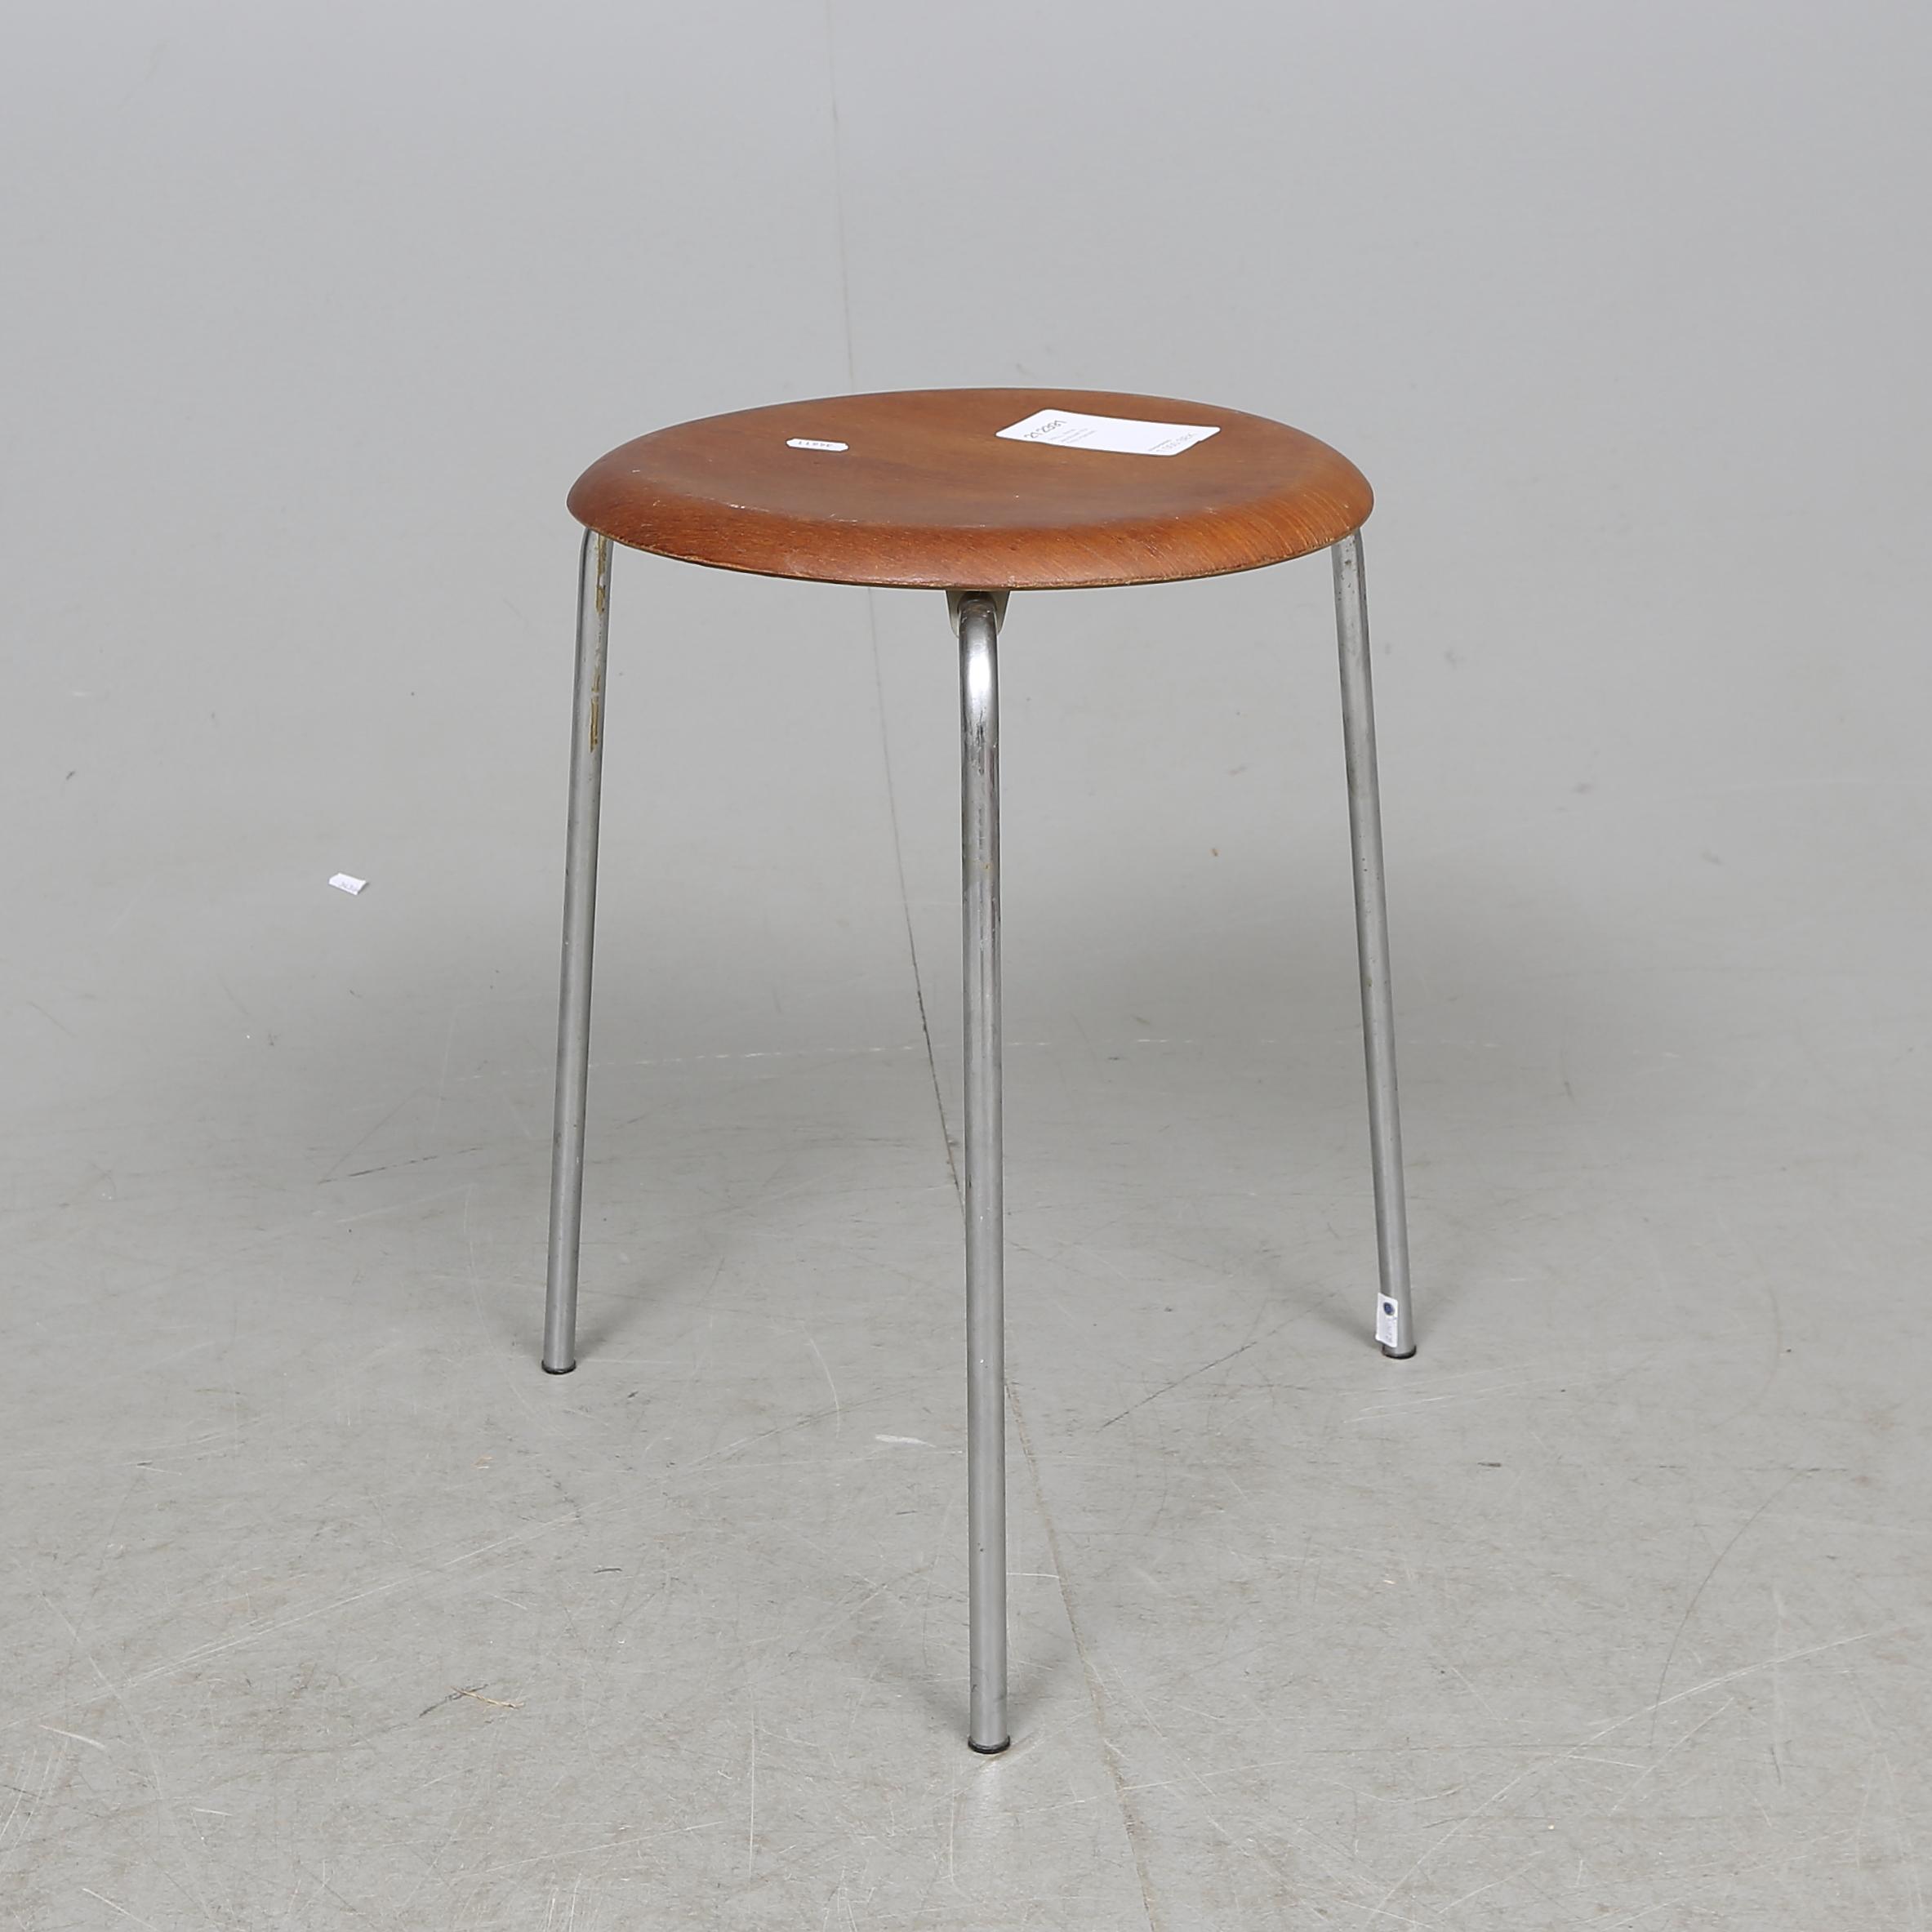 Pall Arne Jacobsen För Fritz Hansen Furniture Armchairs Chairs